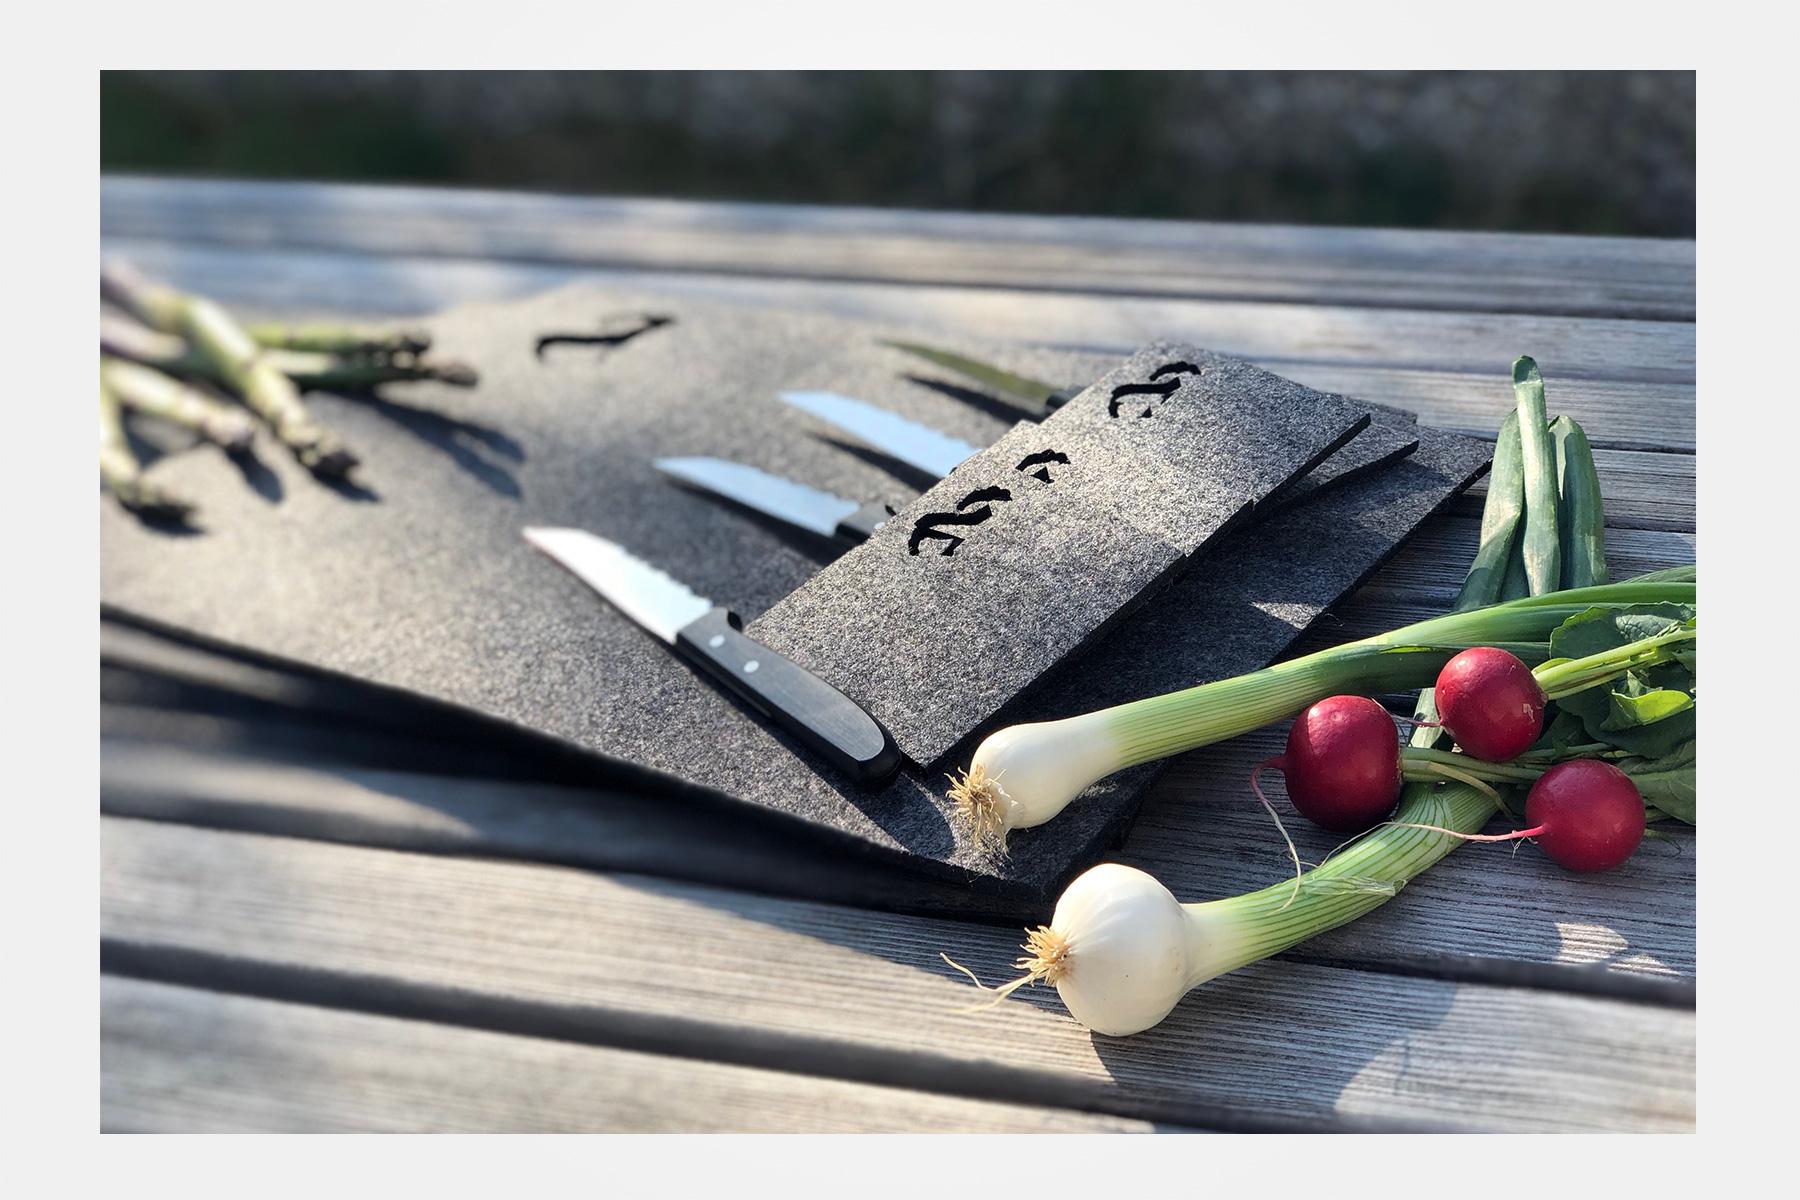 Set da tavola steinlin con 4 coltelli da bistecca best of switzerland monte coltello - Coltelli da tavola montana ...